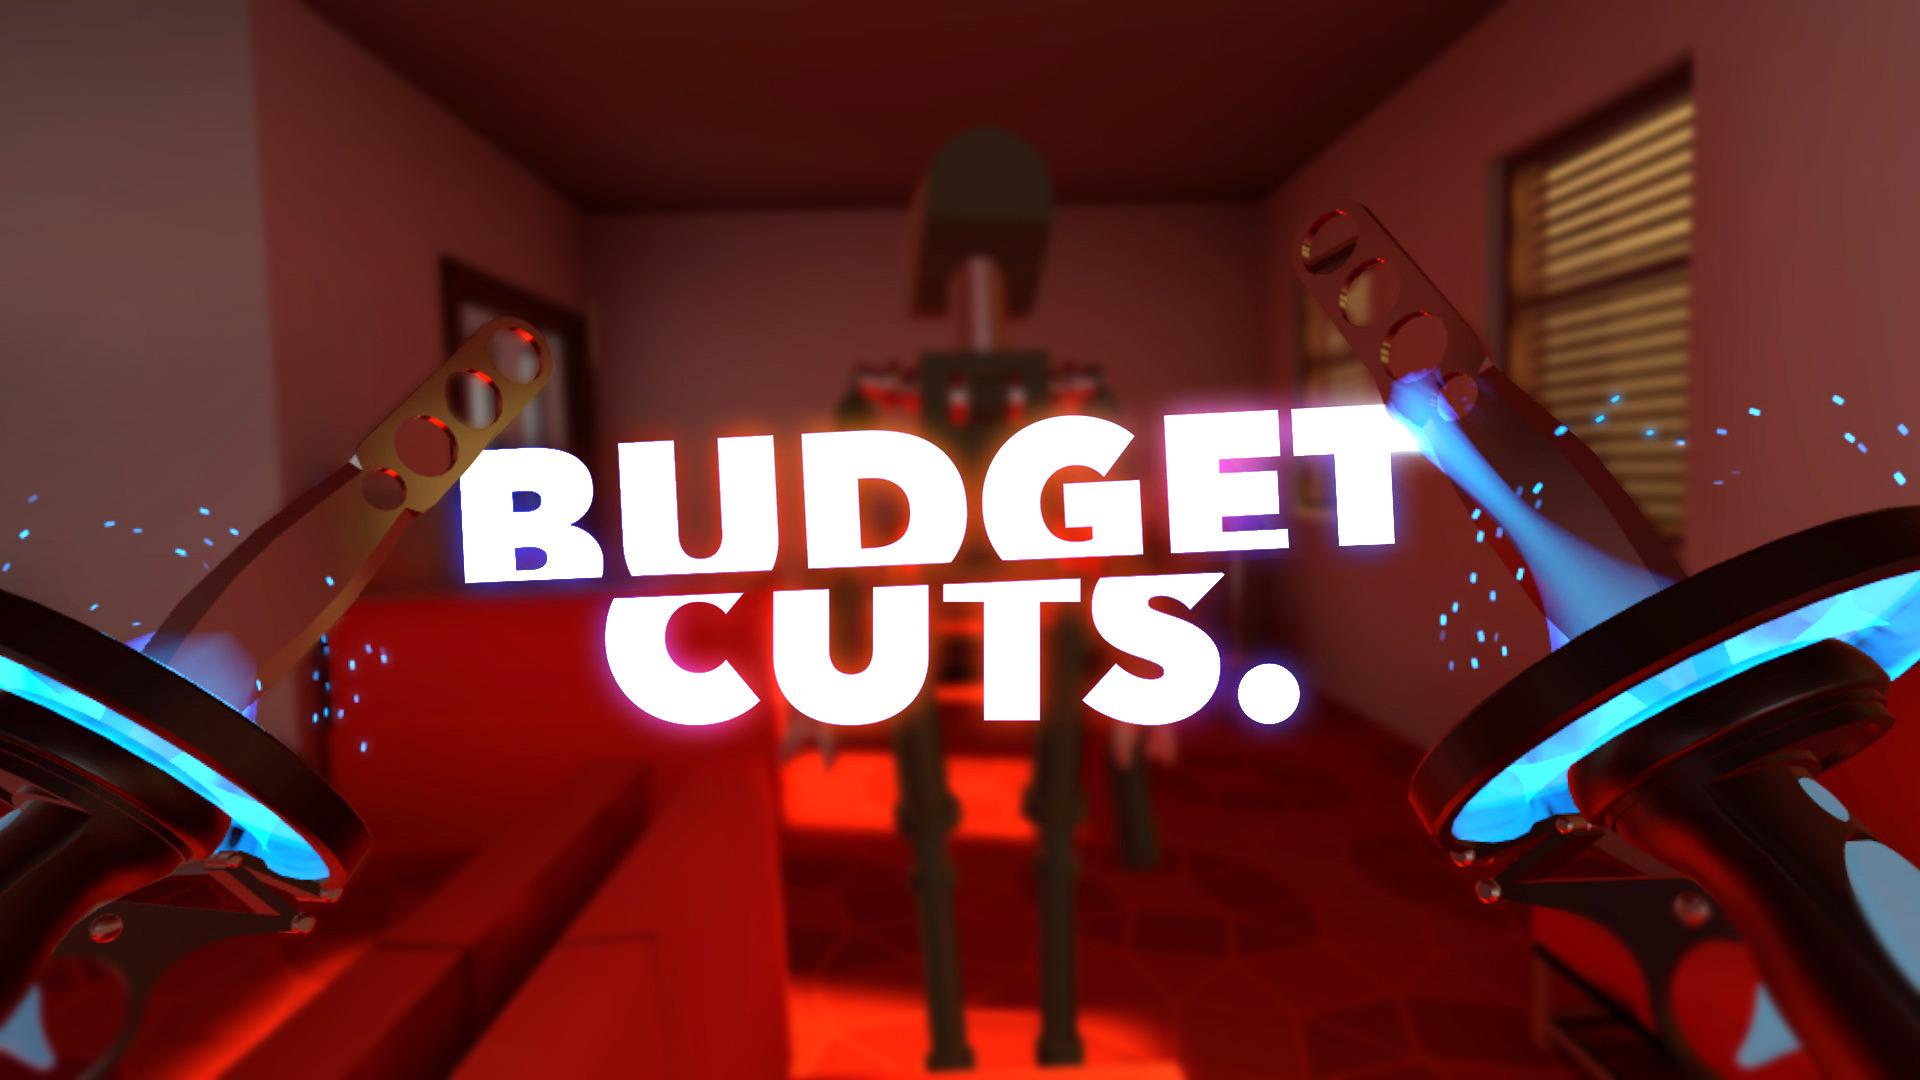 HTC Vive《预算削减》